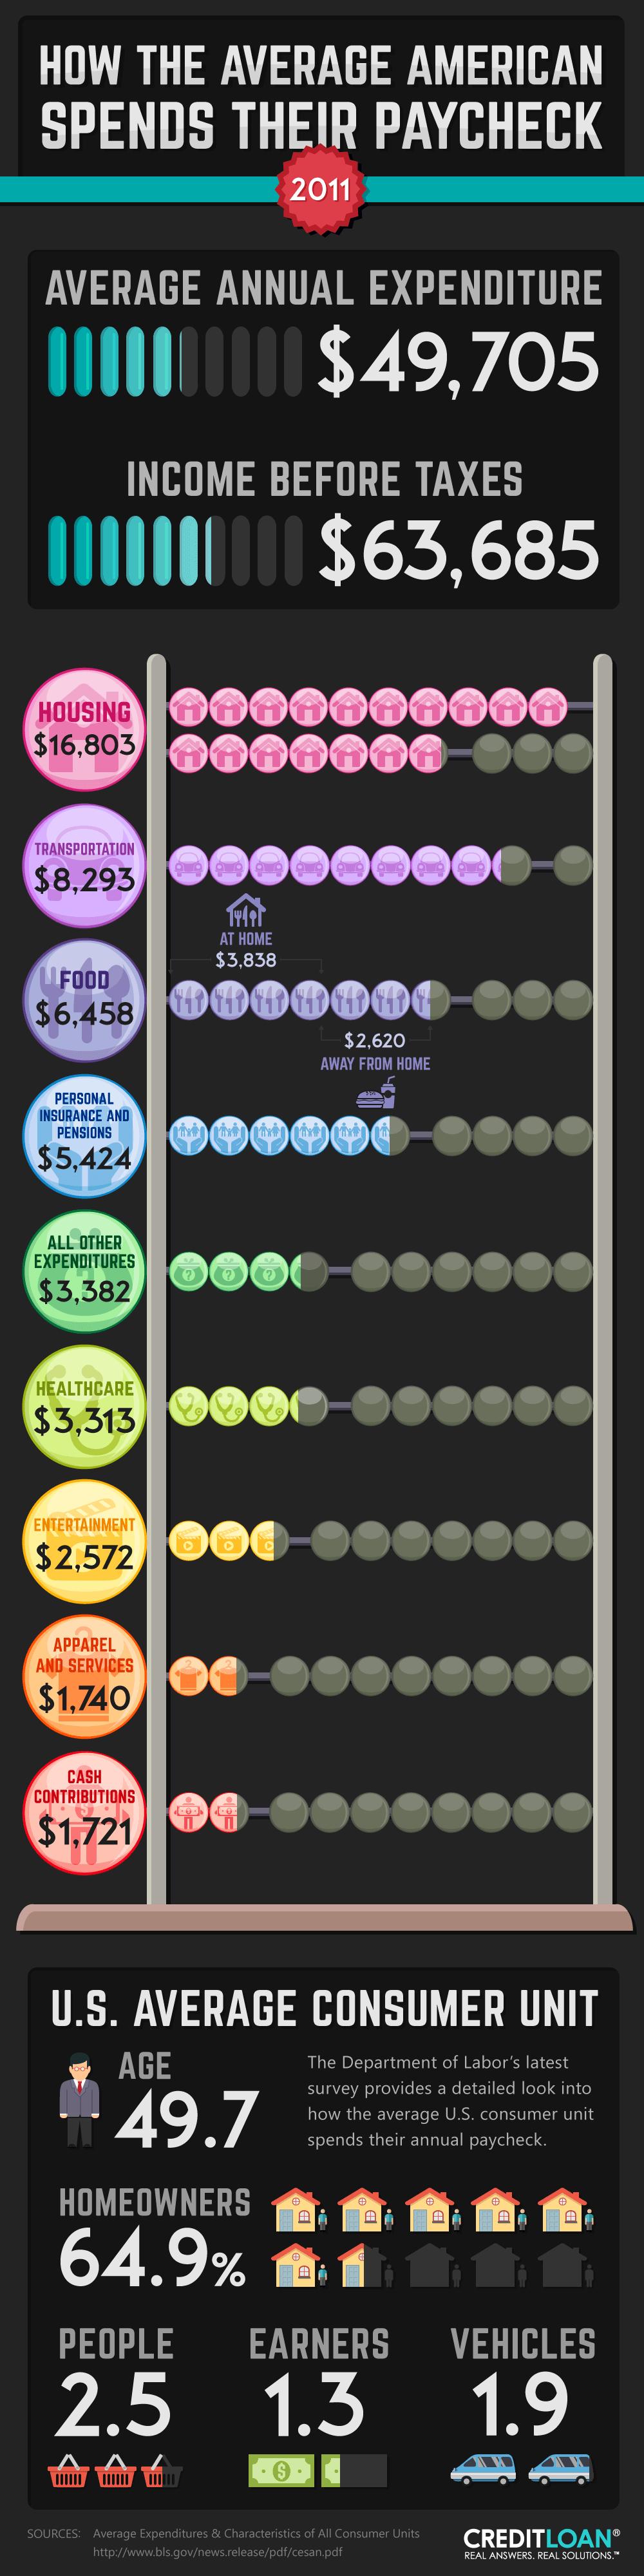 Consumer Spending - 2011